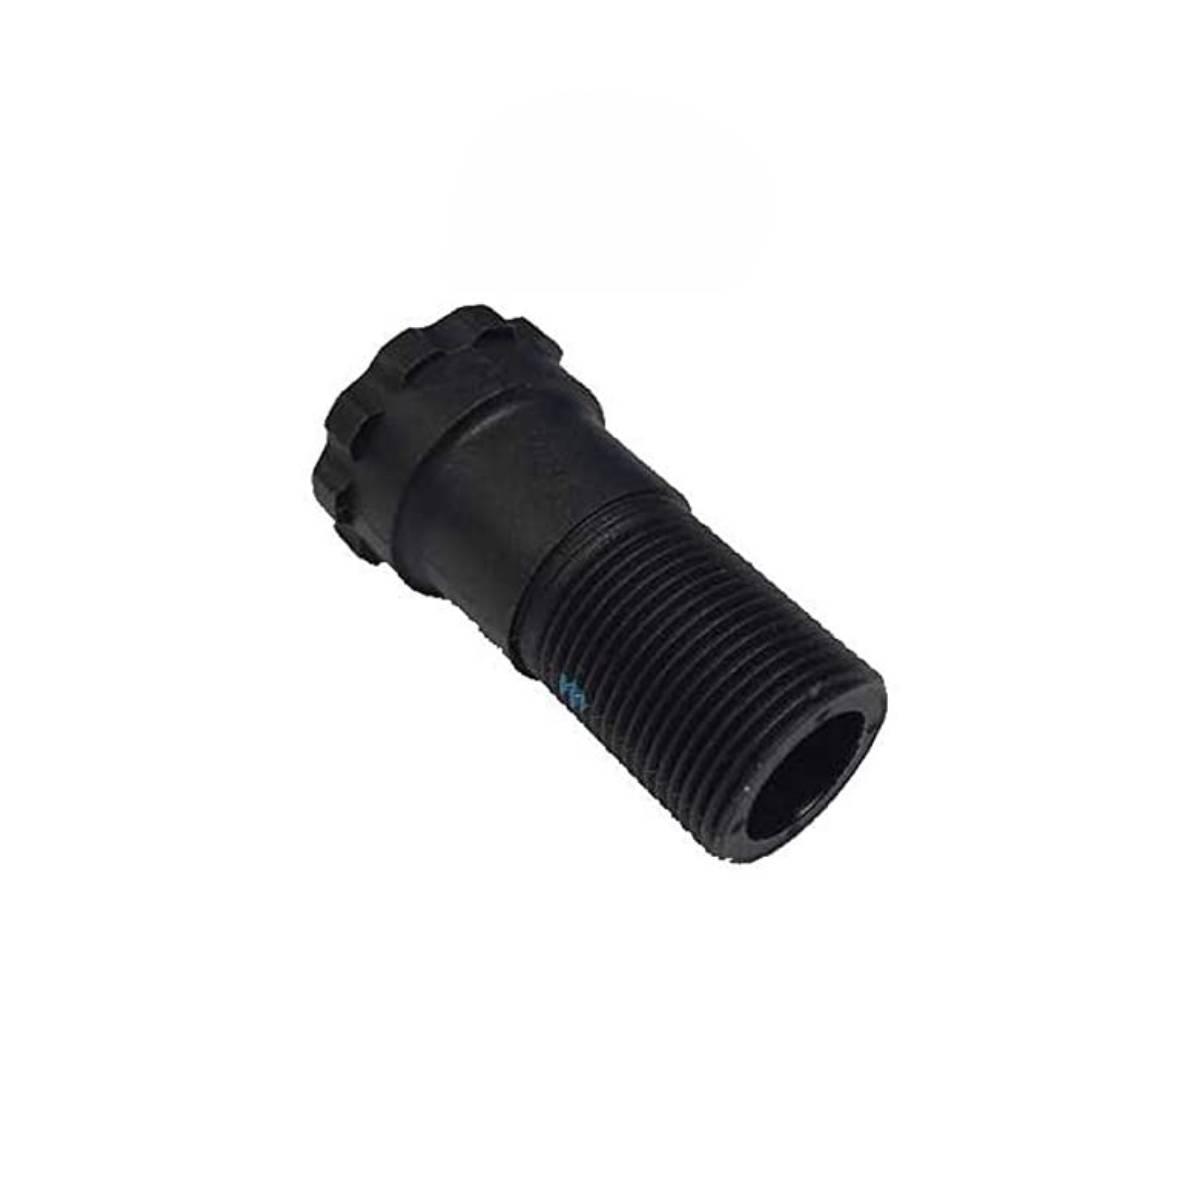 PD-M545 LOCK BOLT (LEFT) #43Z 1410